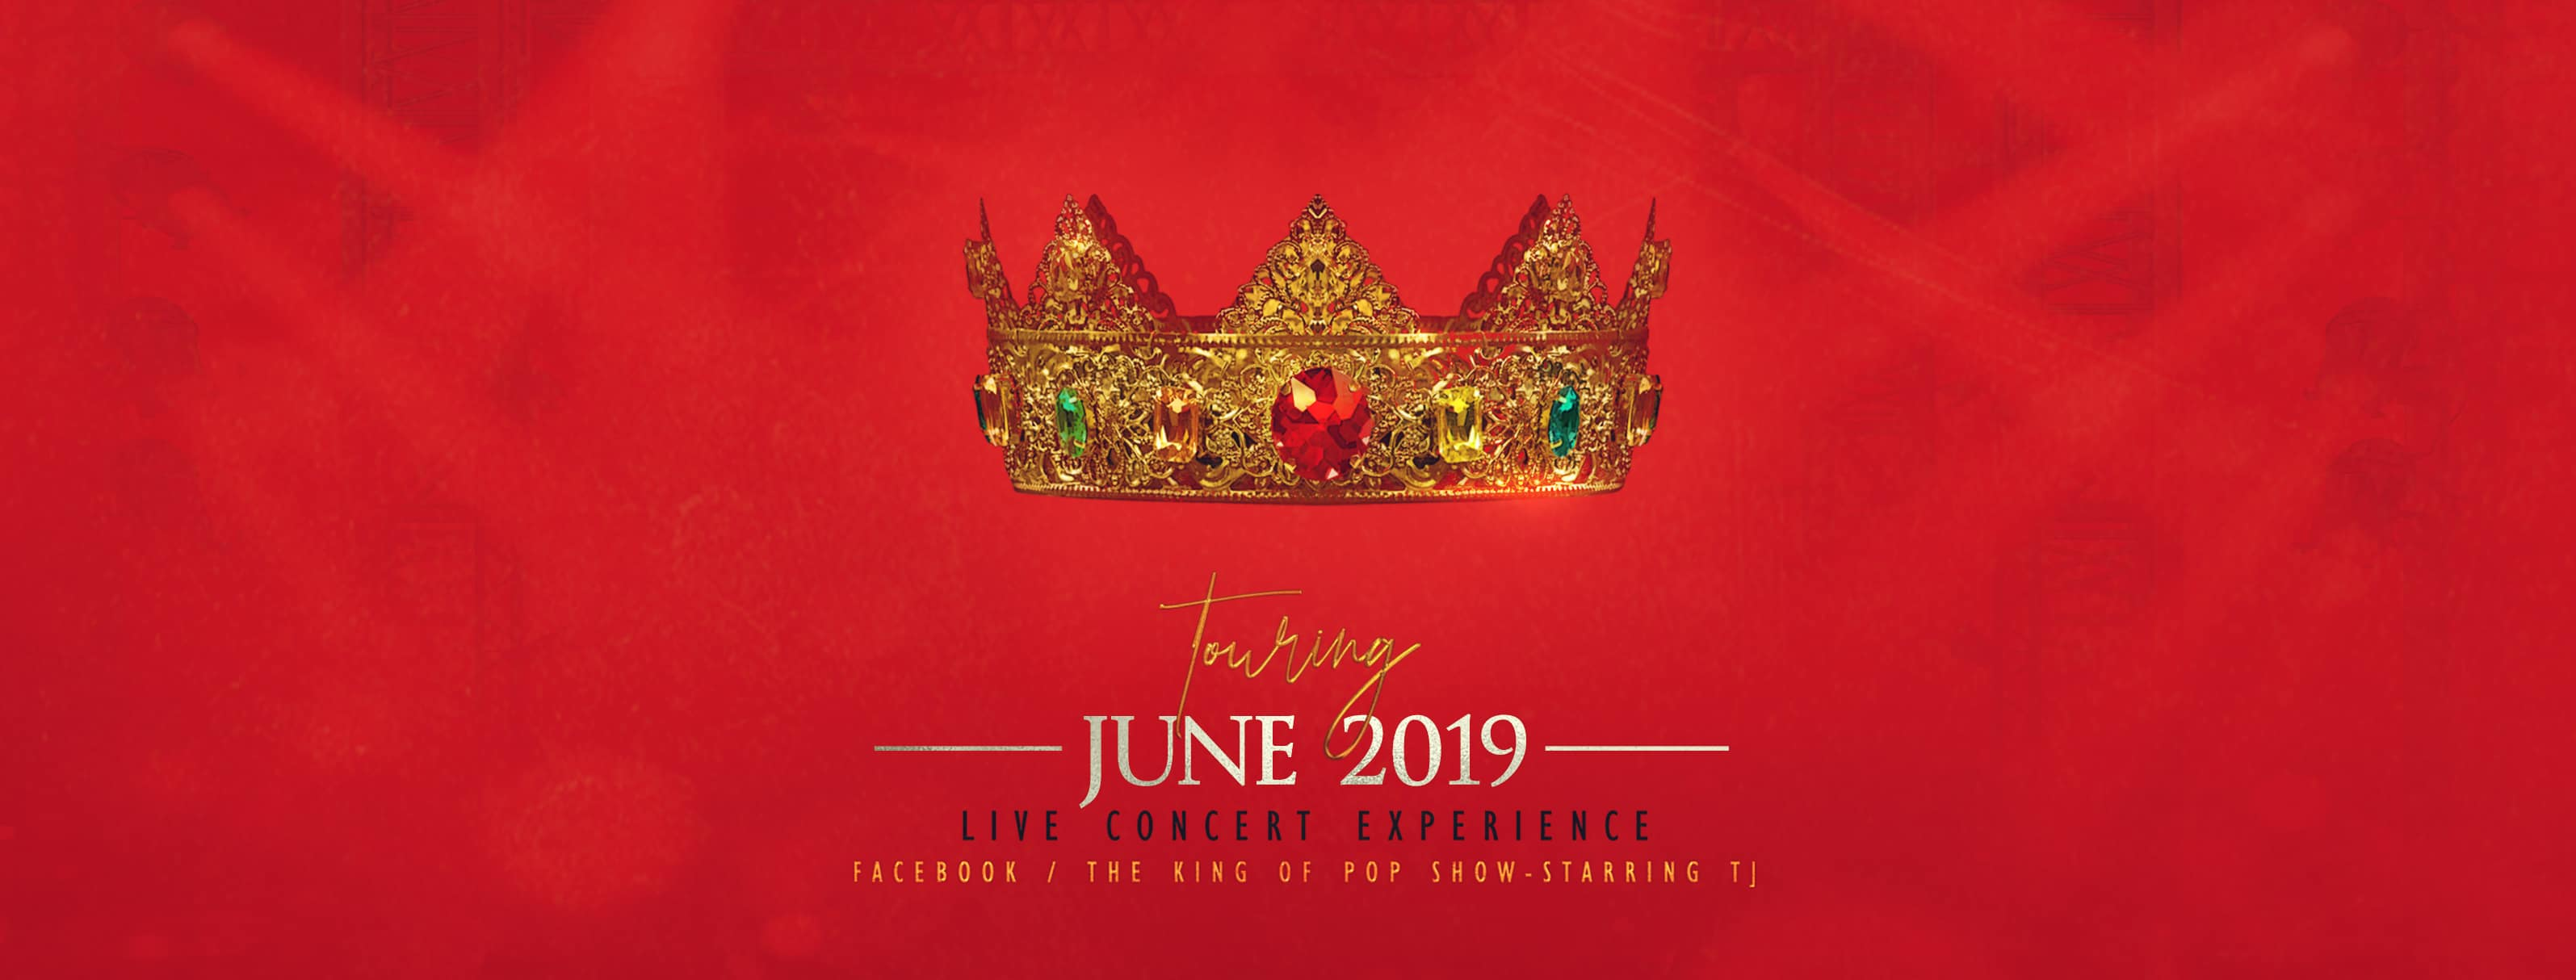 TJ Michael Jackson - The King of Pop Show